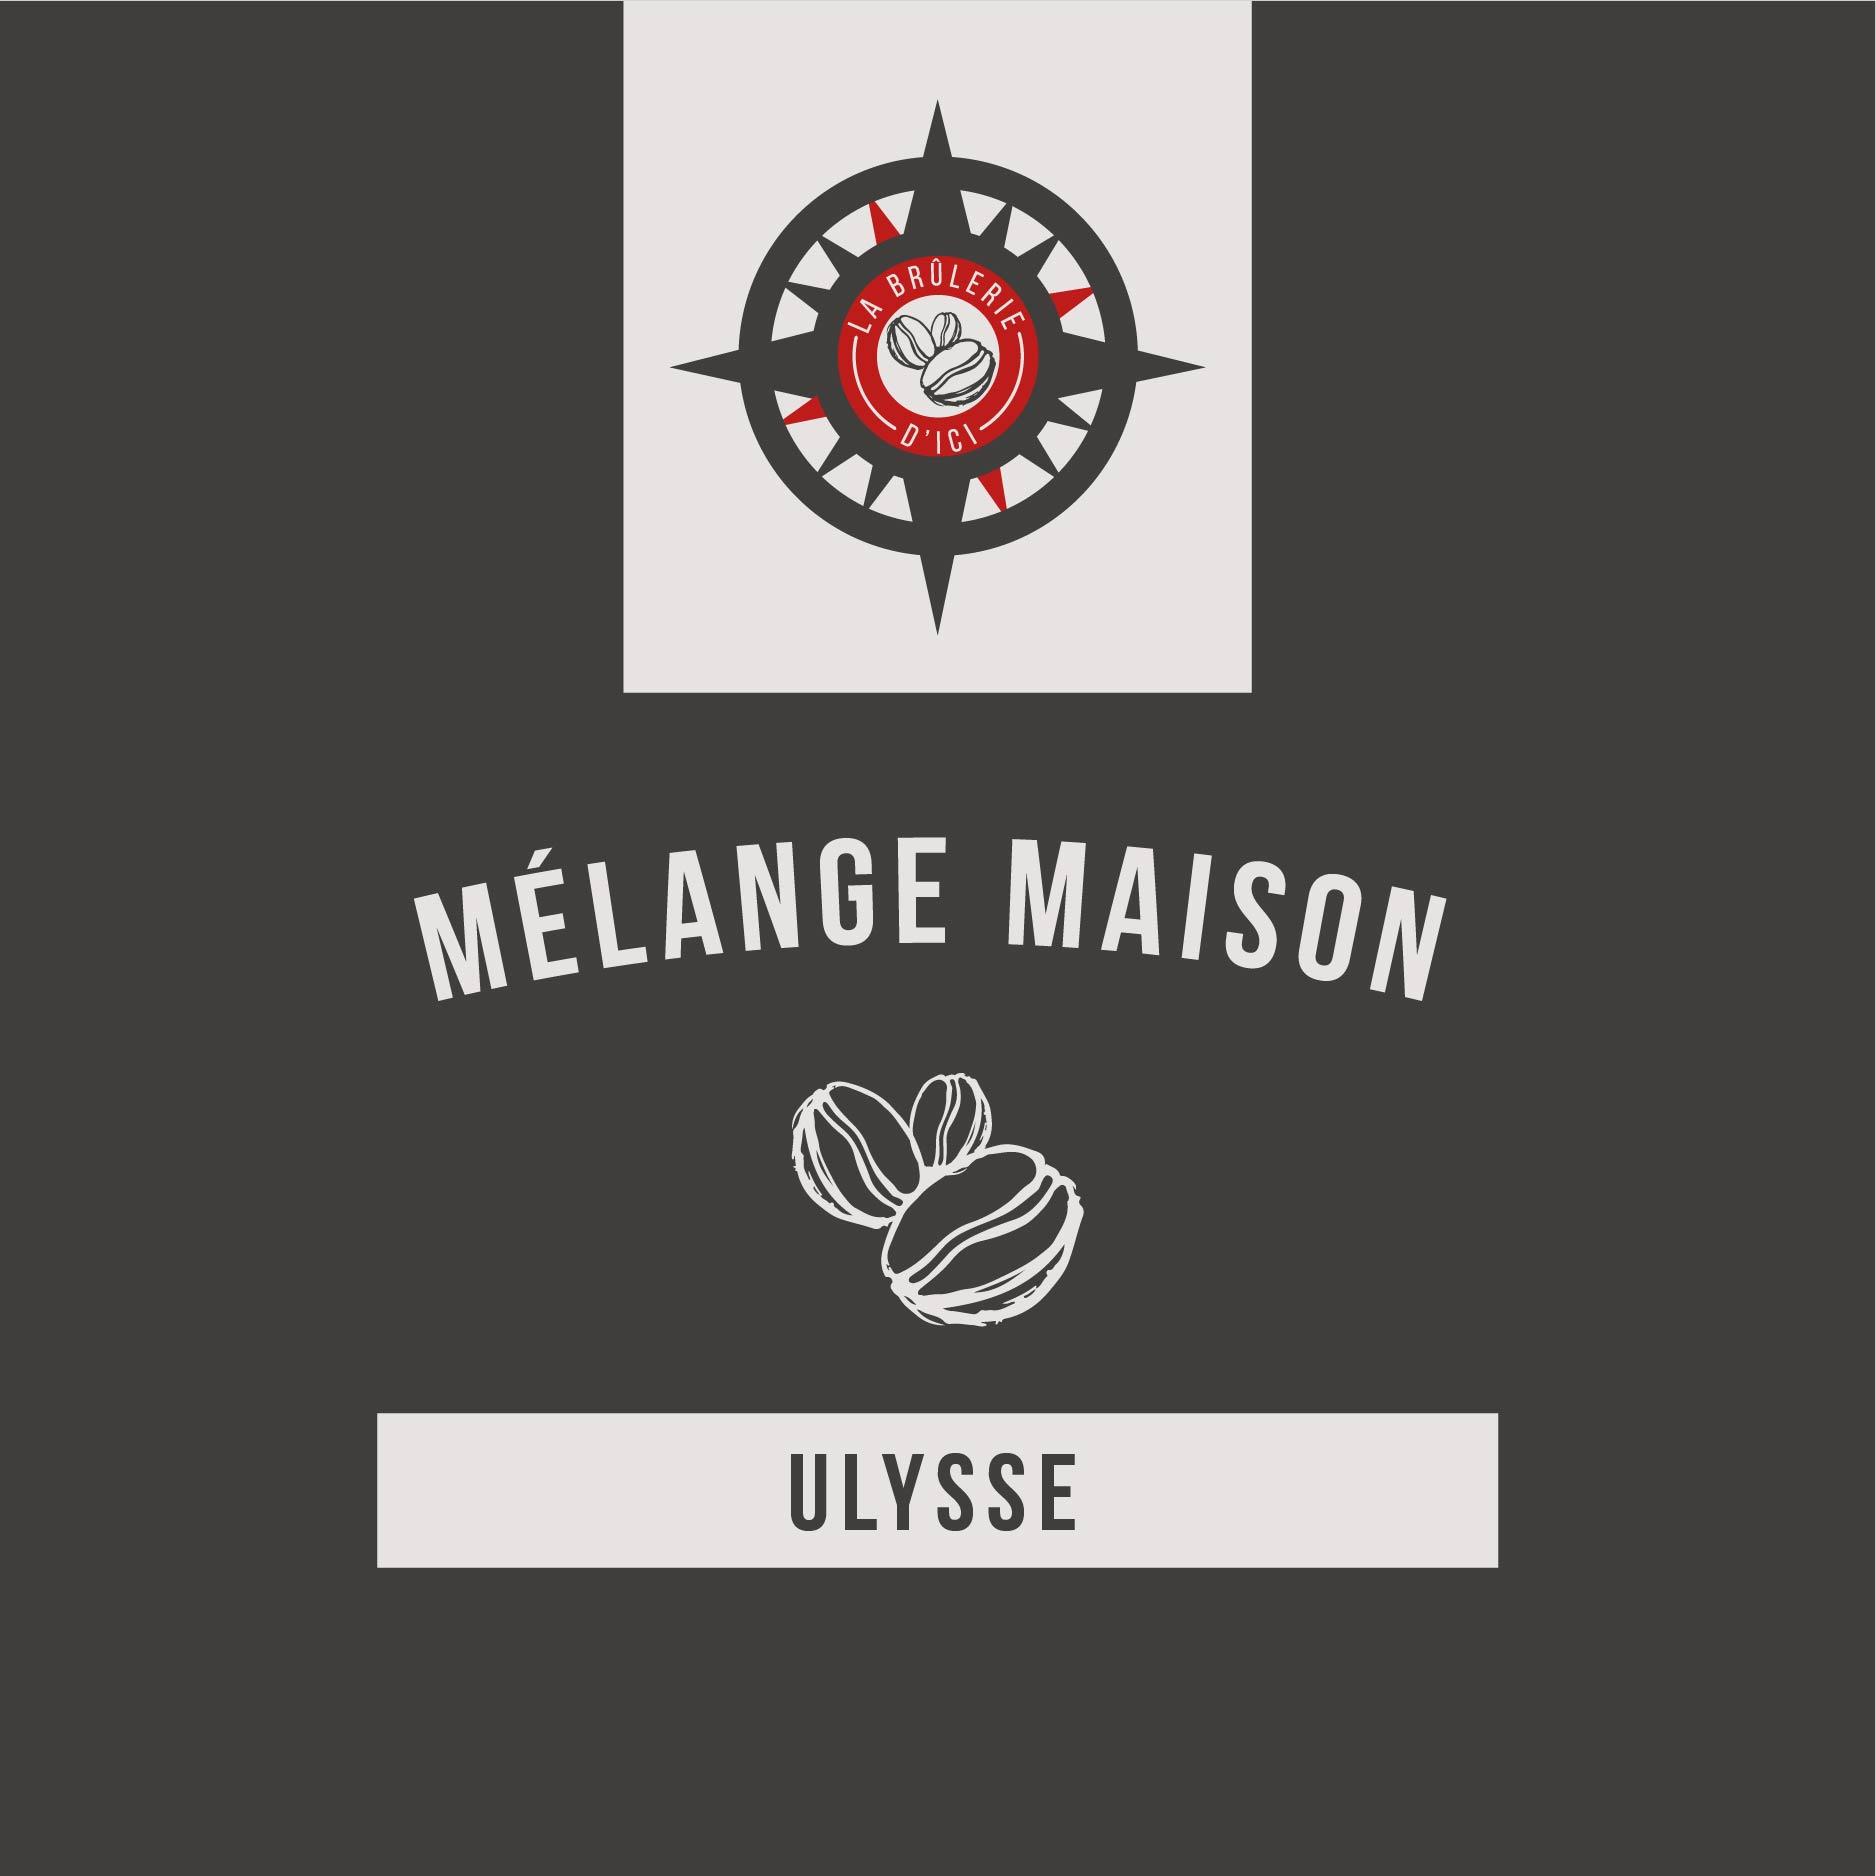 L'Ulysse - Mélange maison